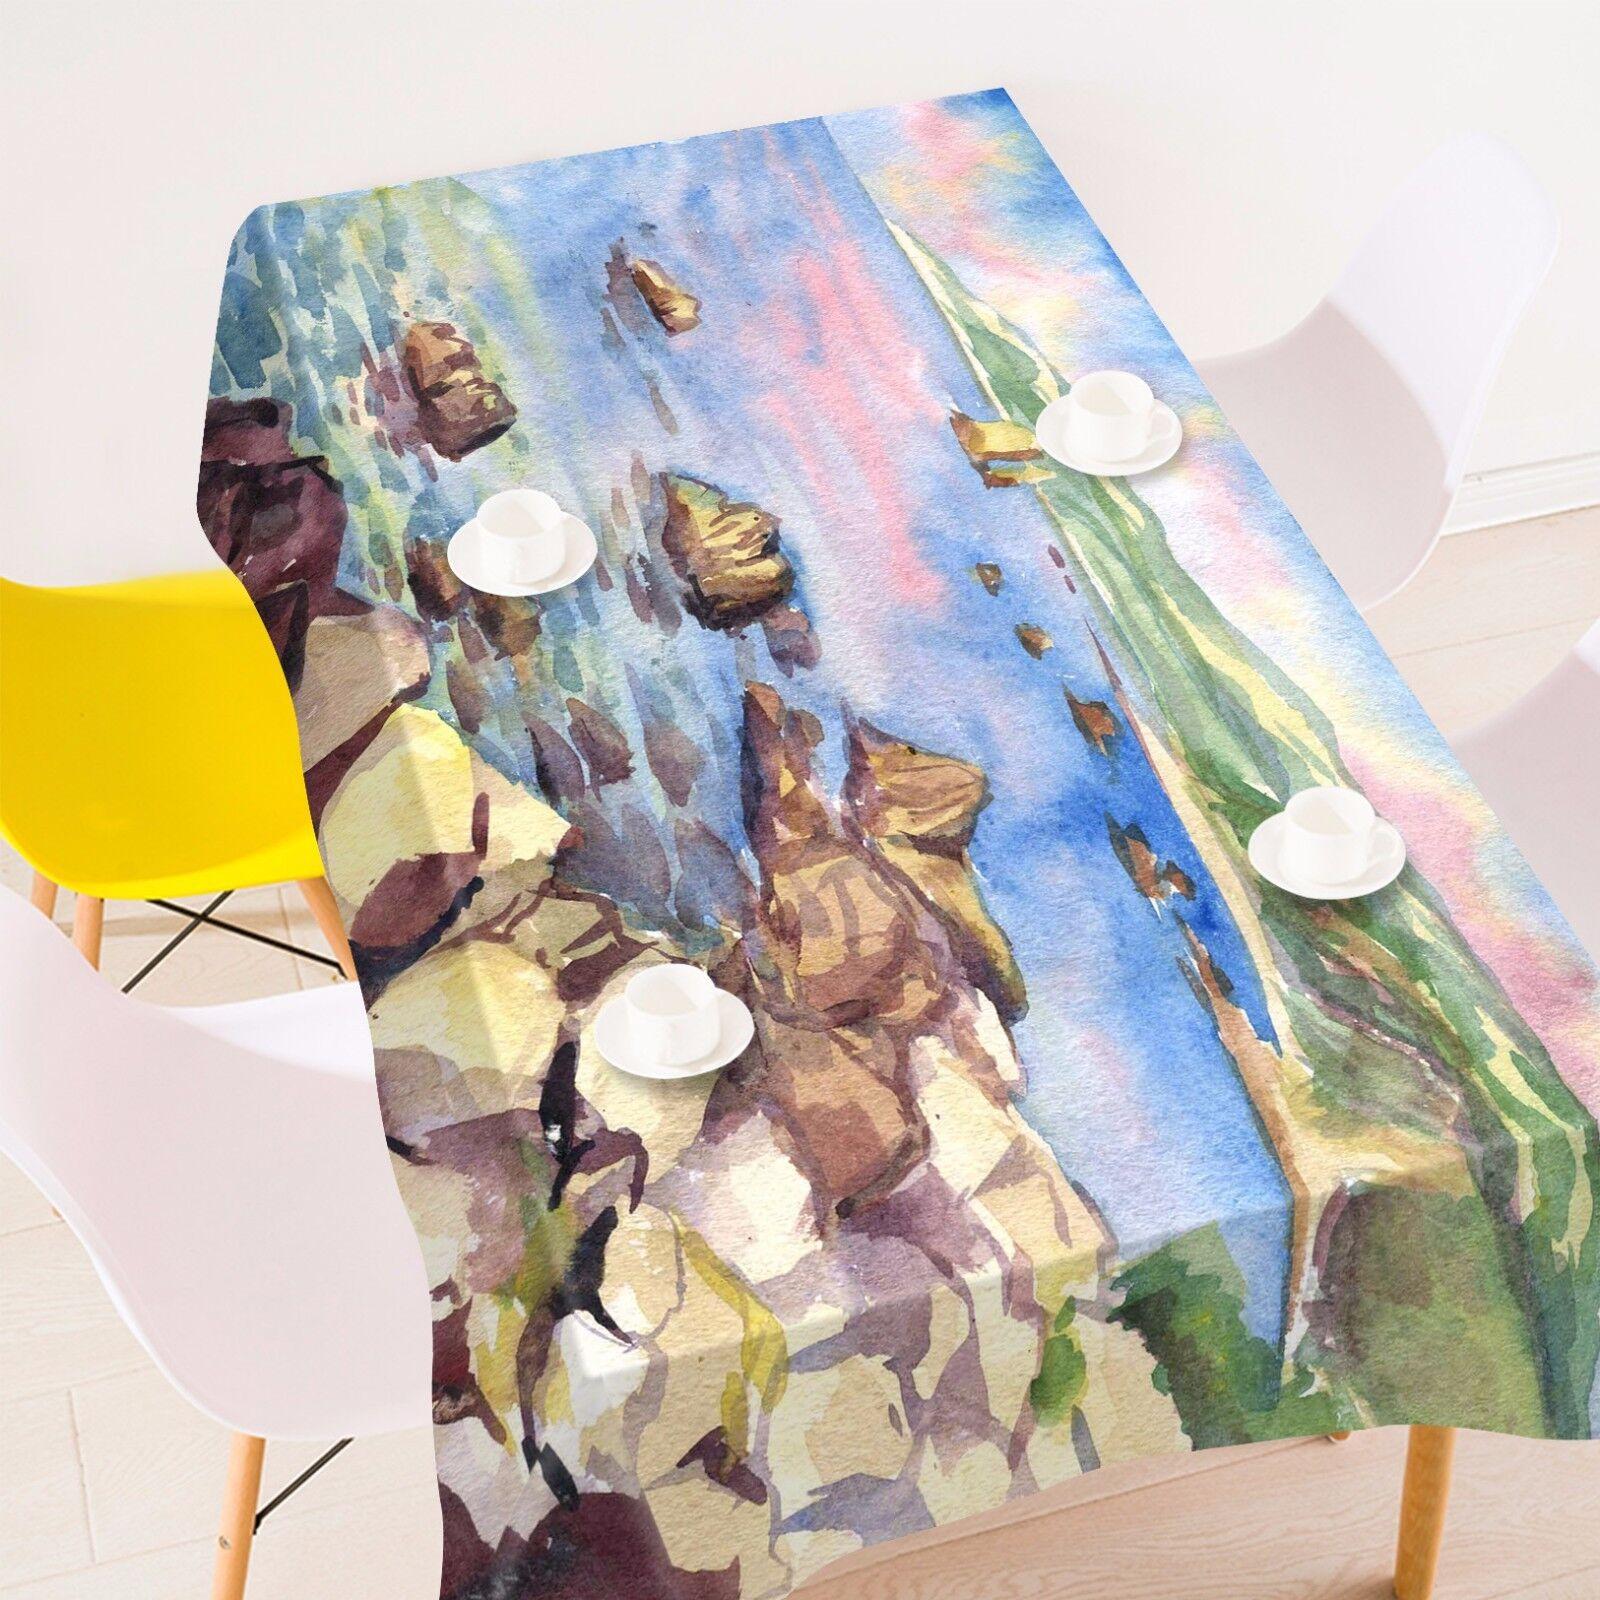 3D River sky97 Tablecloth Table Cover Cloth Birthday Birthday Birthday Party Event AJ WALLPAPER UK 0201b6